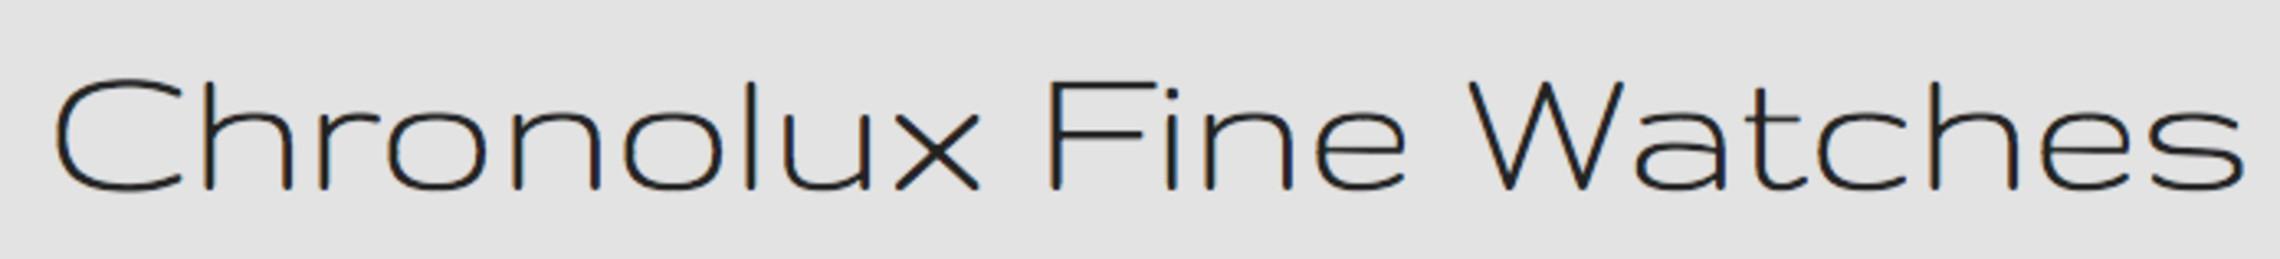 chronolux fine watches- company logo